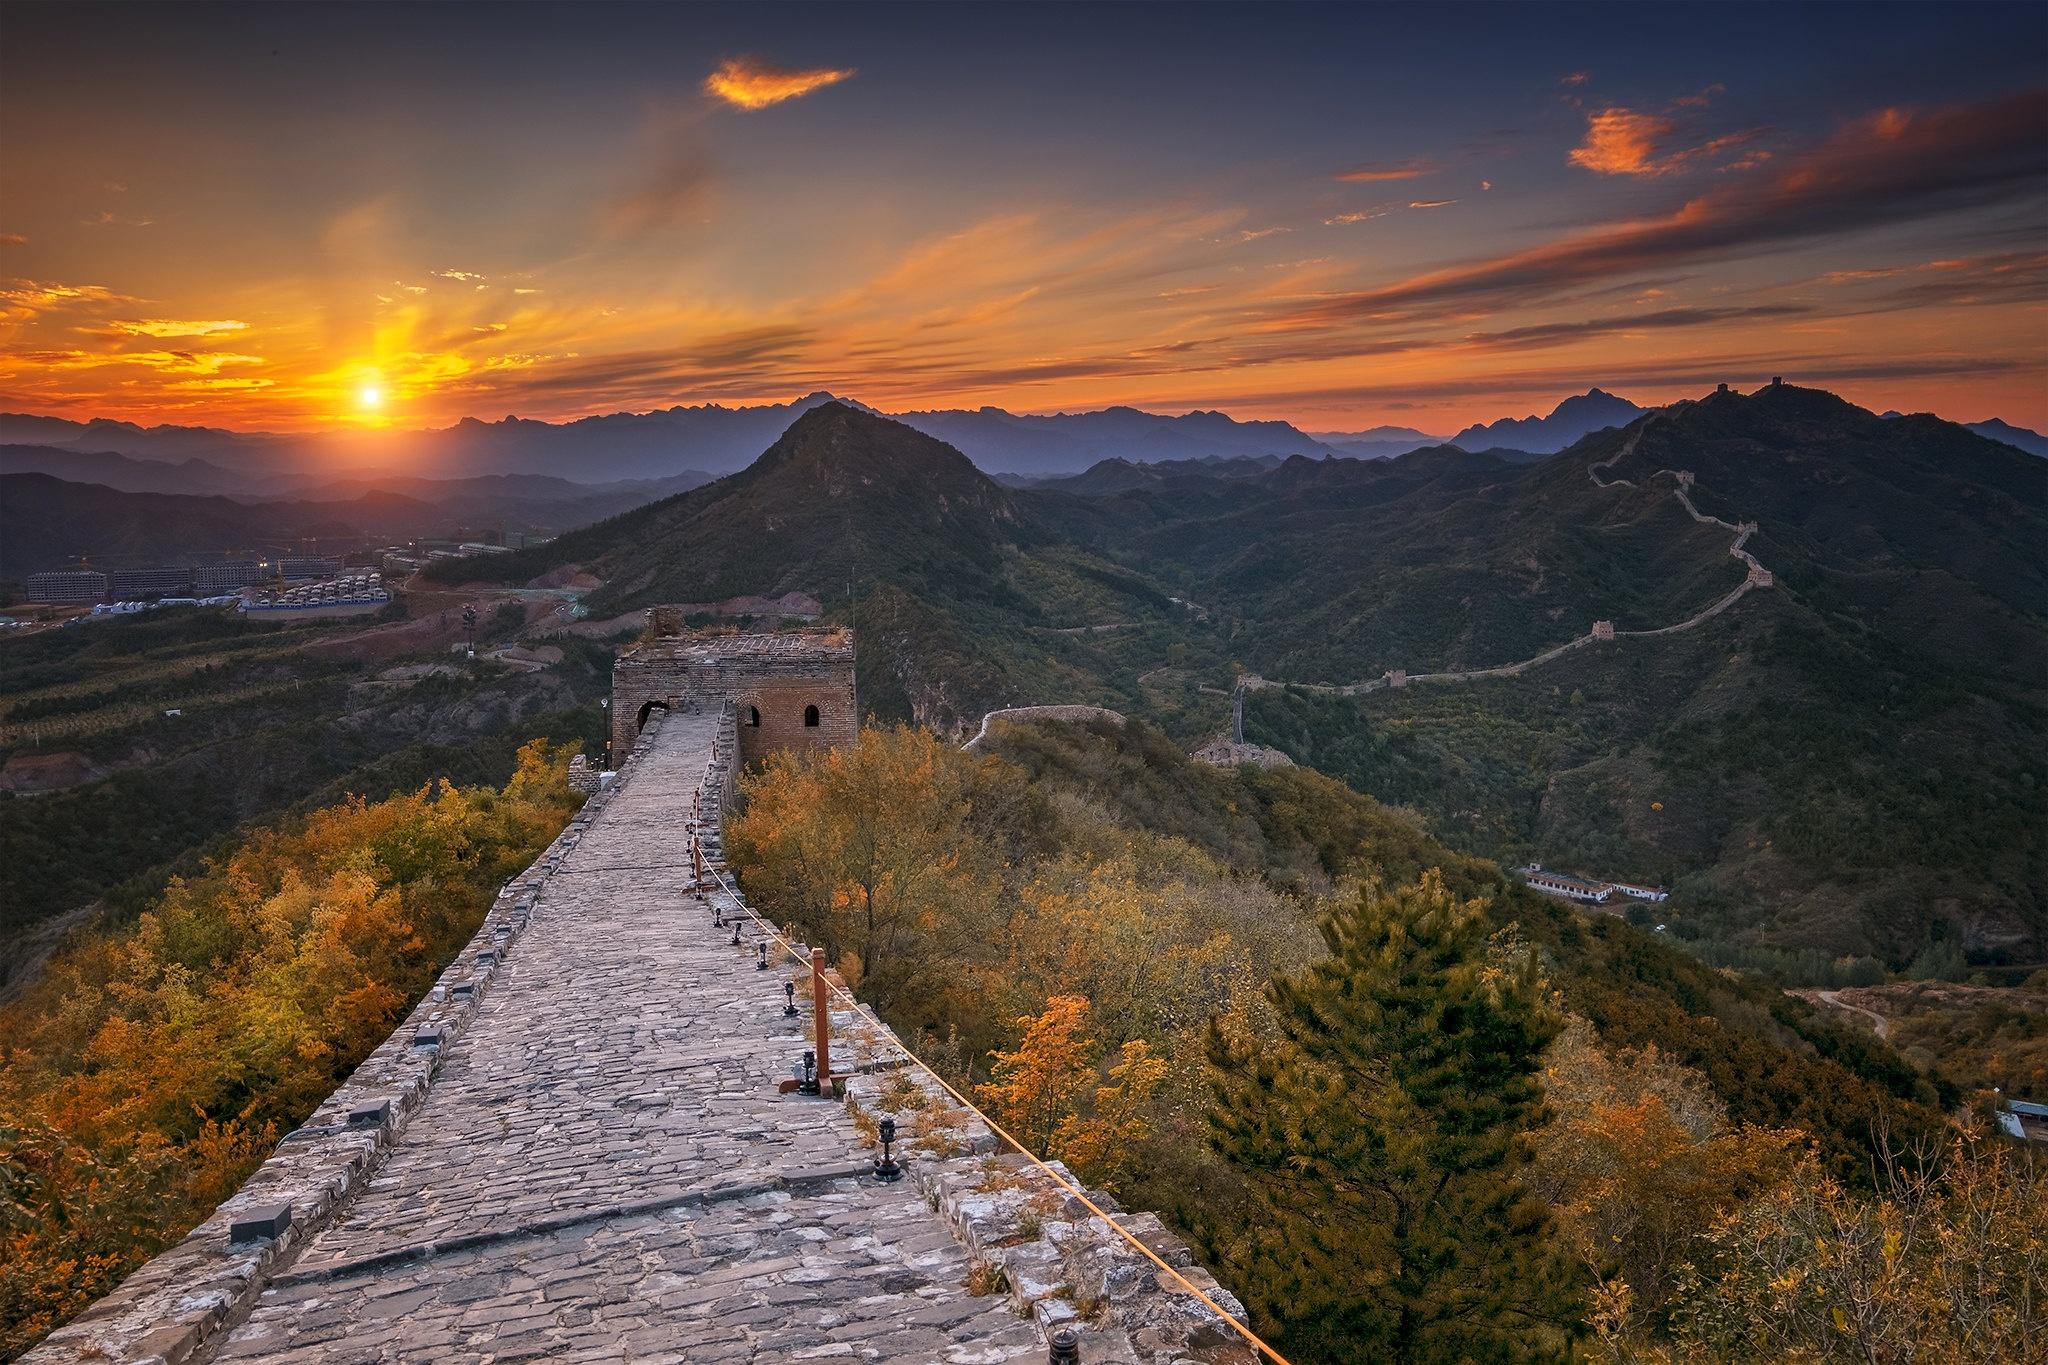 photos of great wall of china